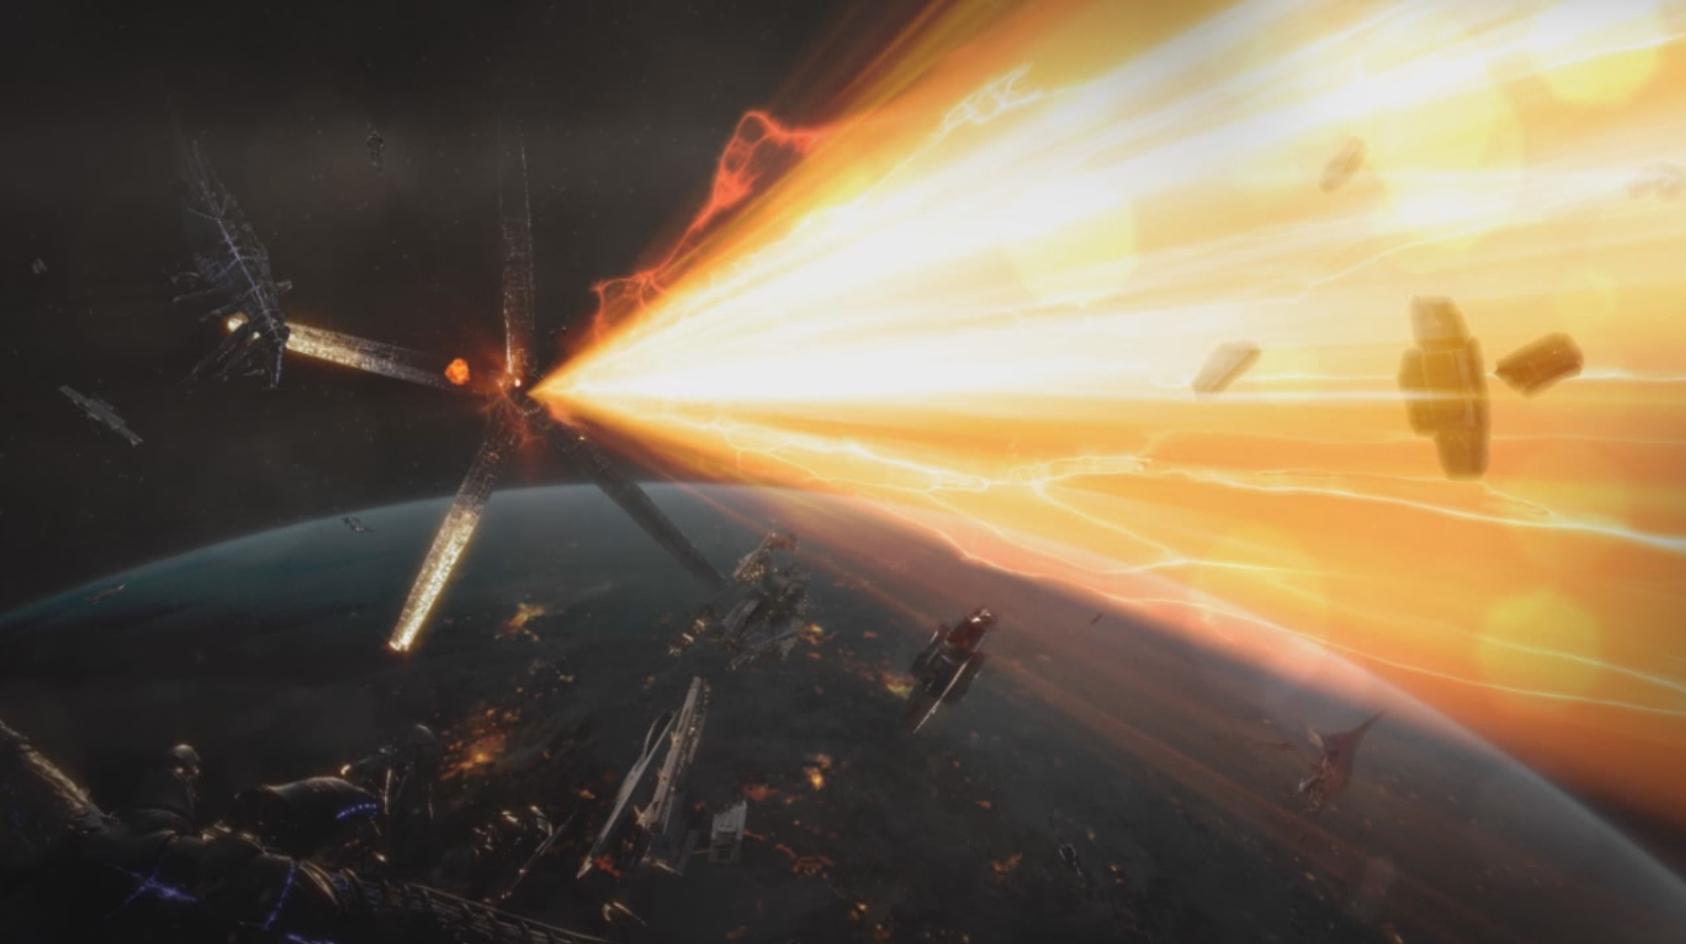 Battle for Earth/Codex Ae5d7e53a5c7b75a163f6b1b6fc04163